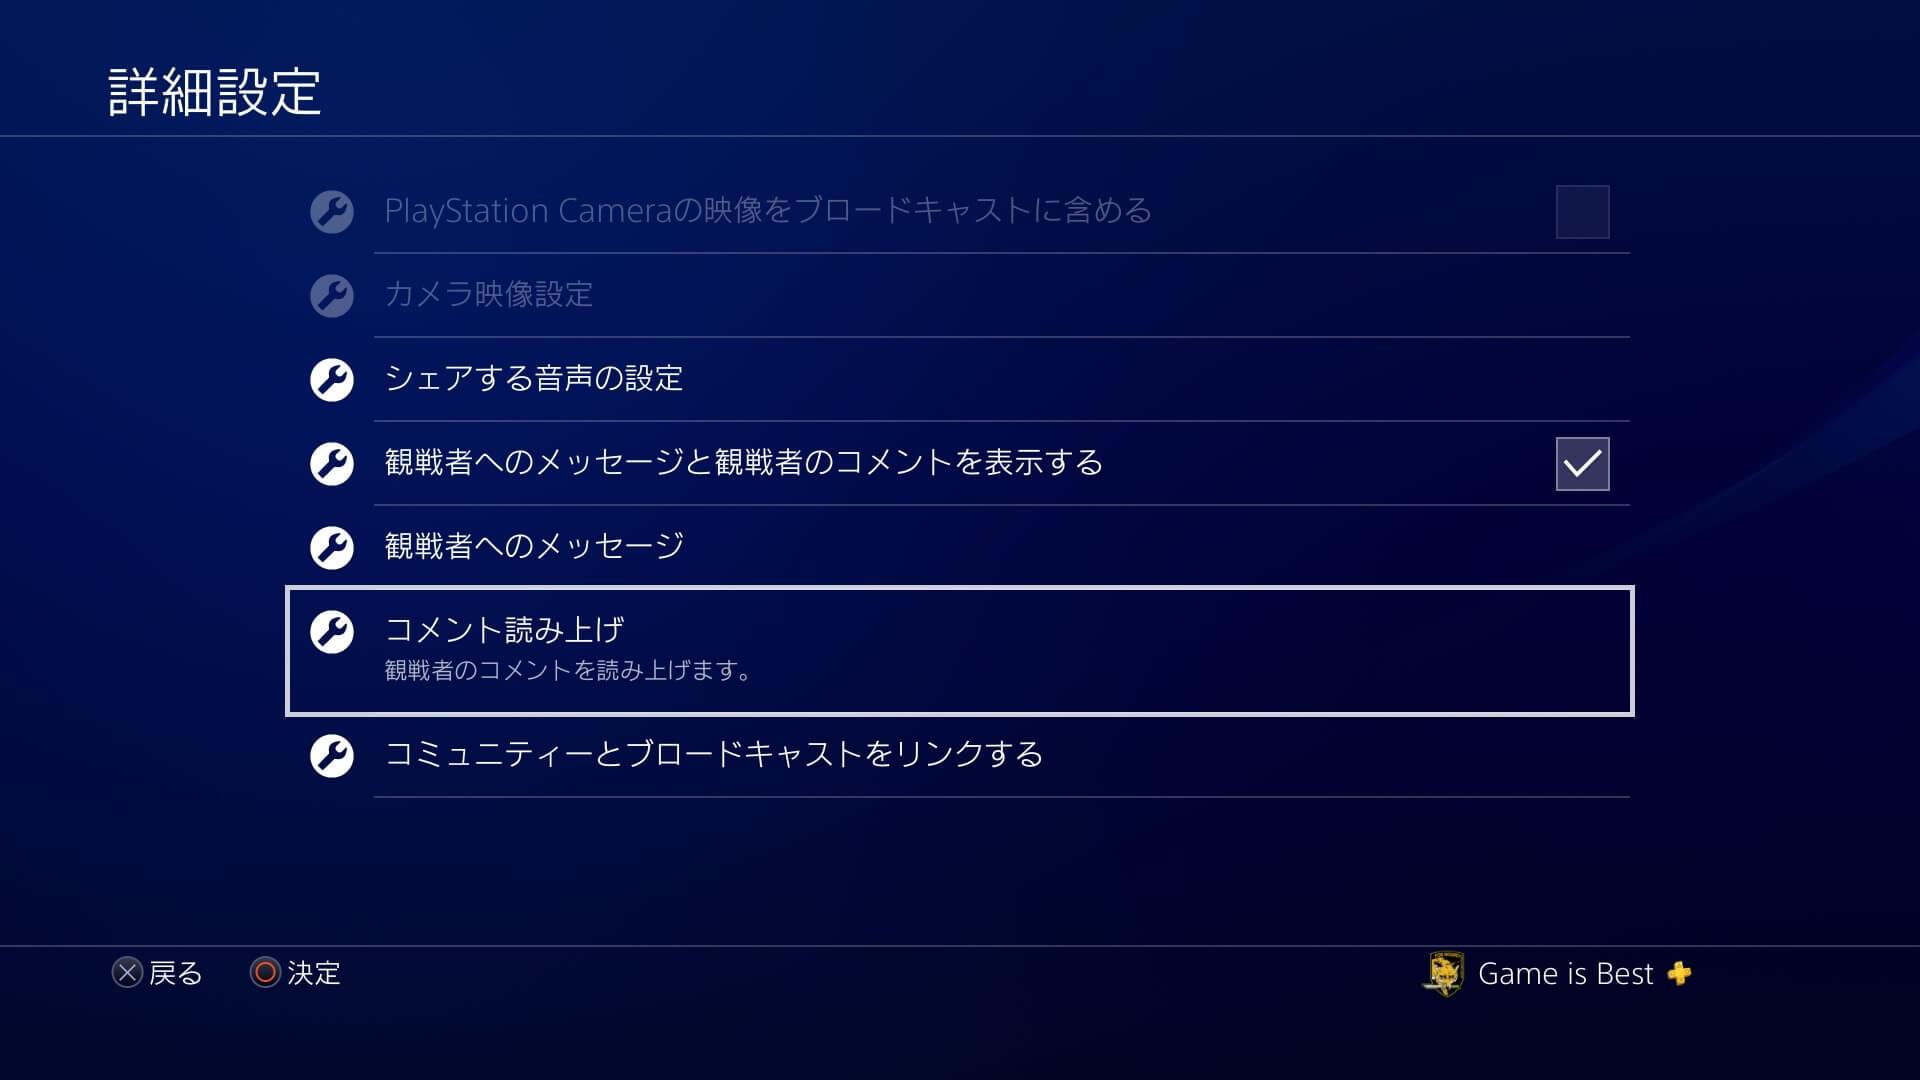 PS4ブロードキャスト設定